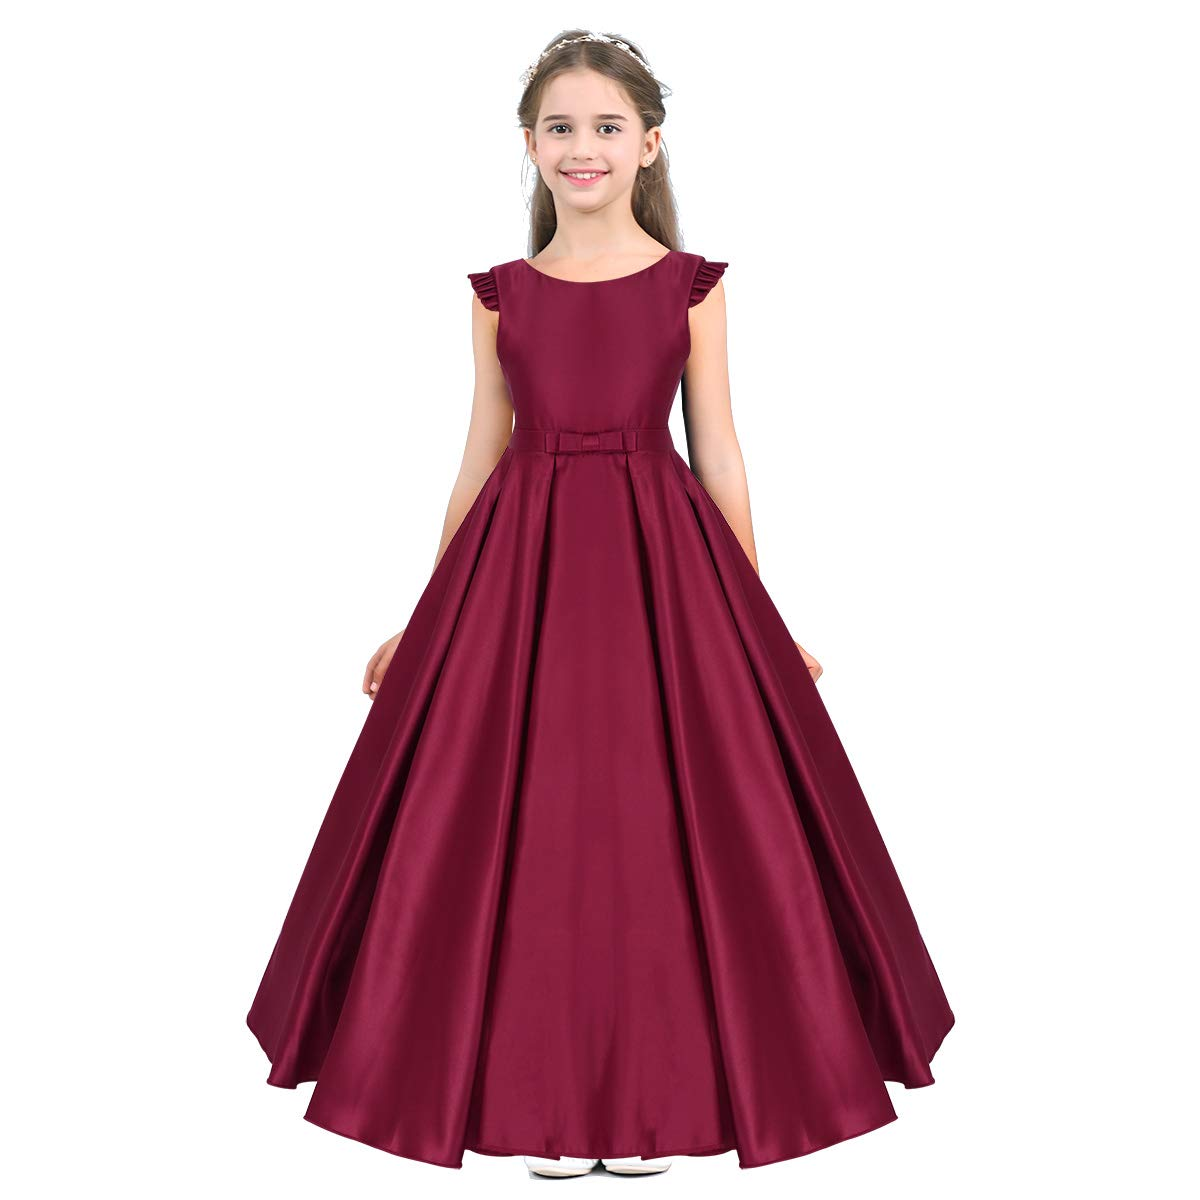 74e072982cd1 iiniim Kids Flower Girl Dress Satin Ruffled Wedding Bridesmaid Dress ...